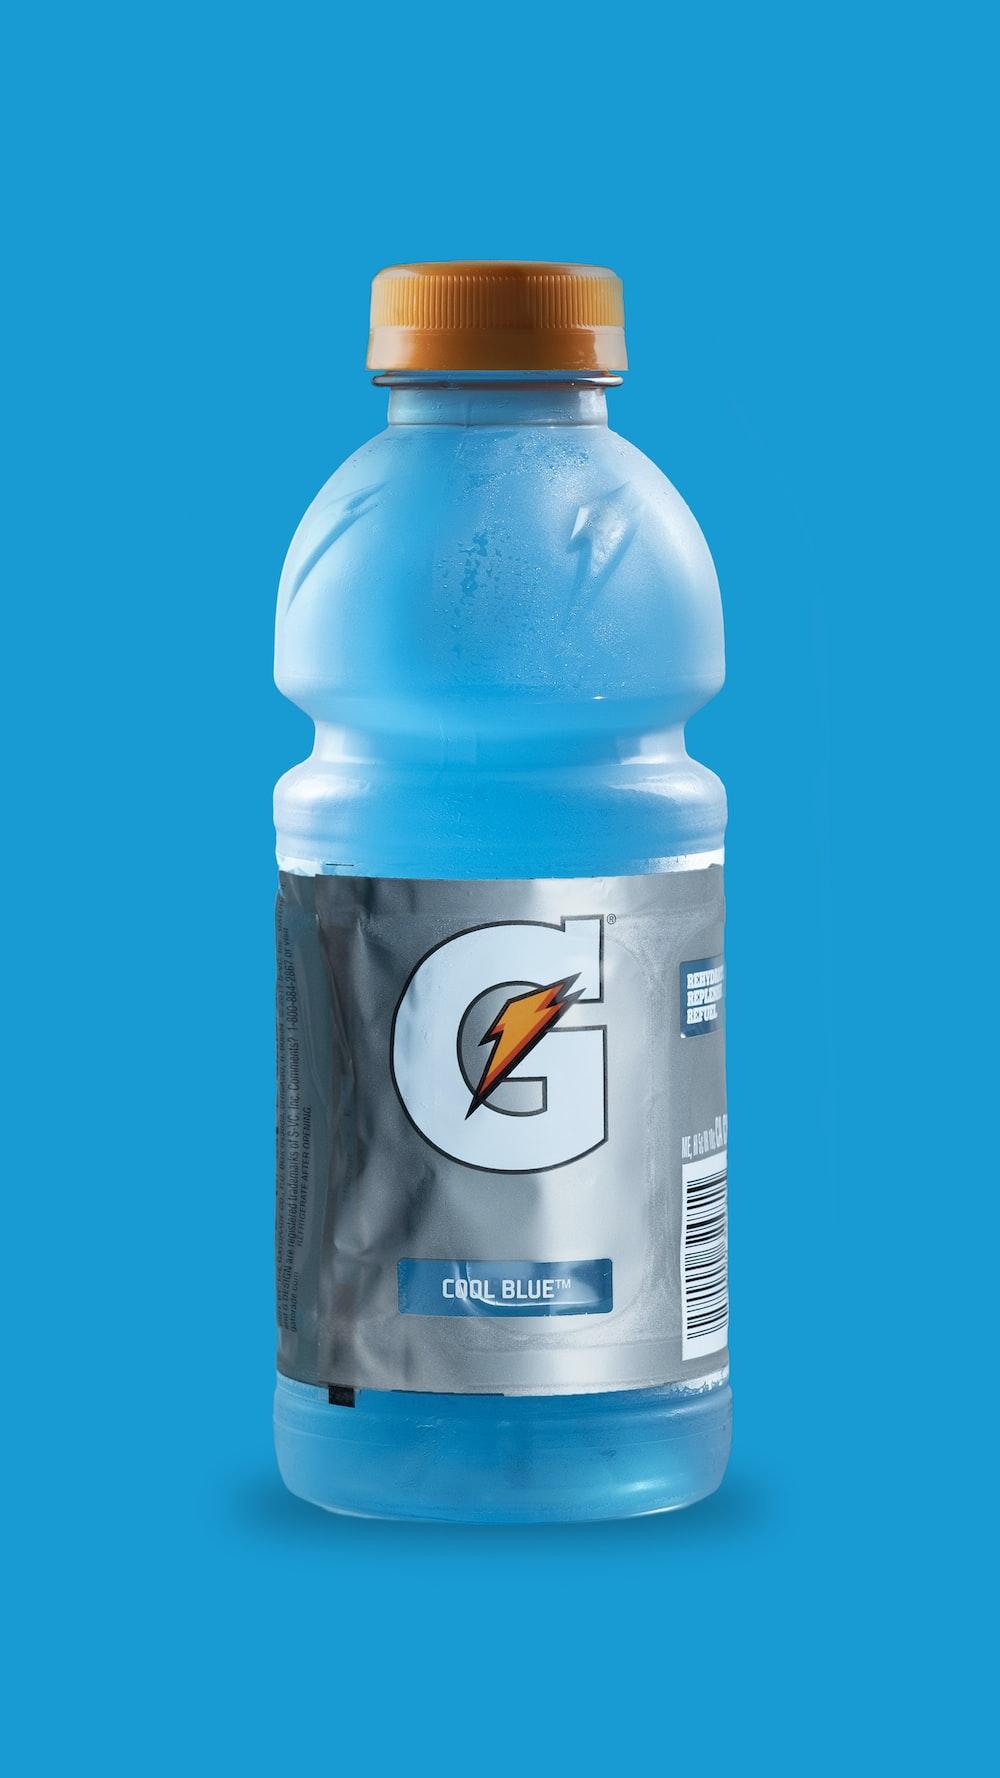 gray and blue Gatorade bottle